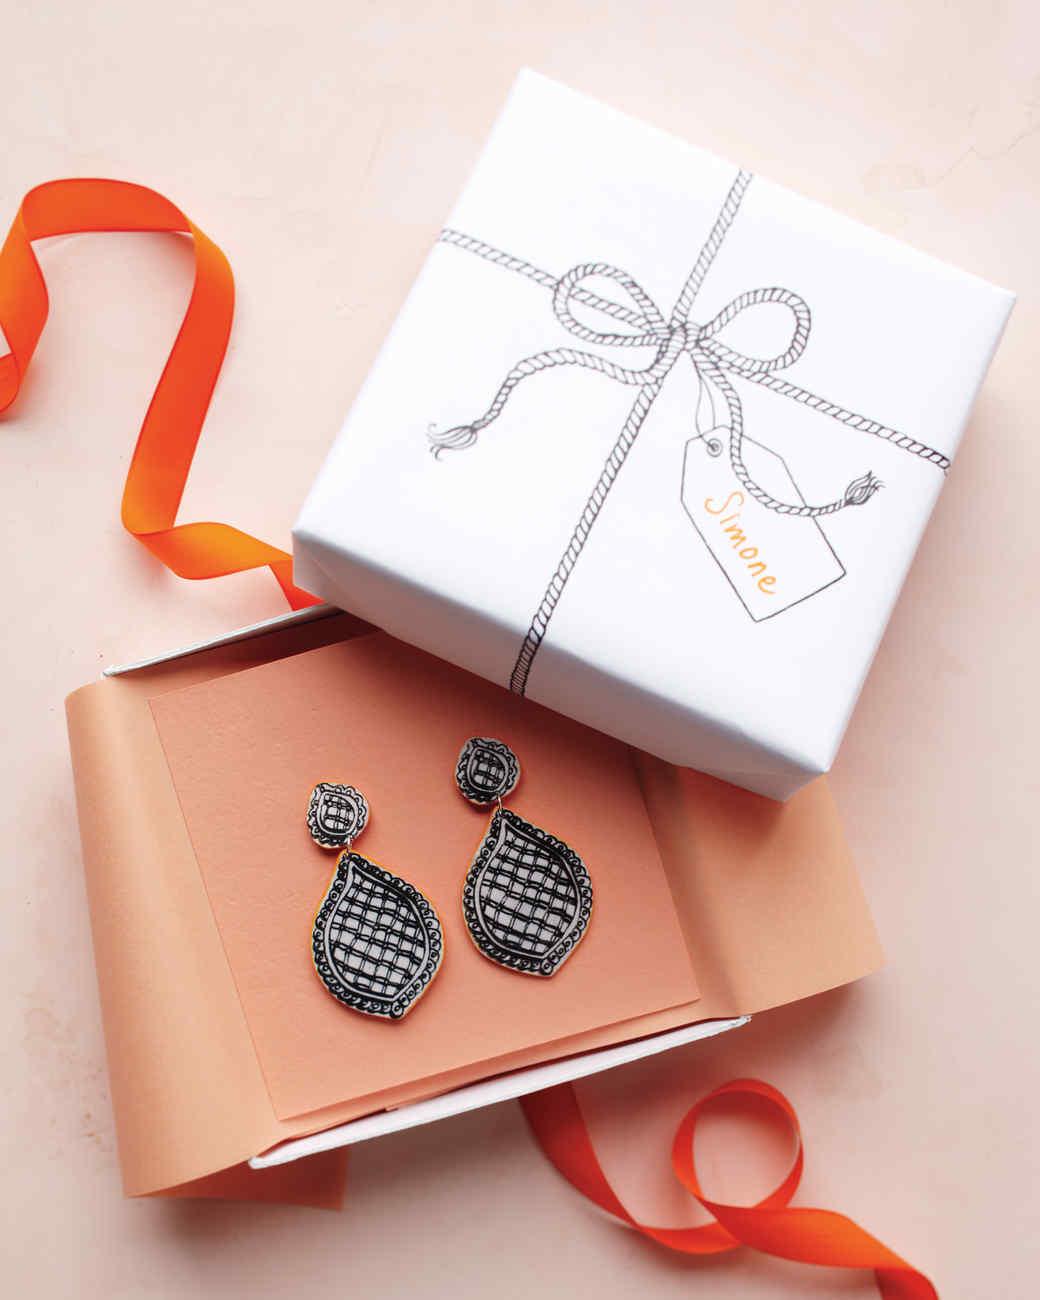 Trompe L'oeil Earrings and Gift Box